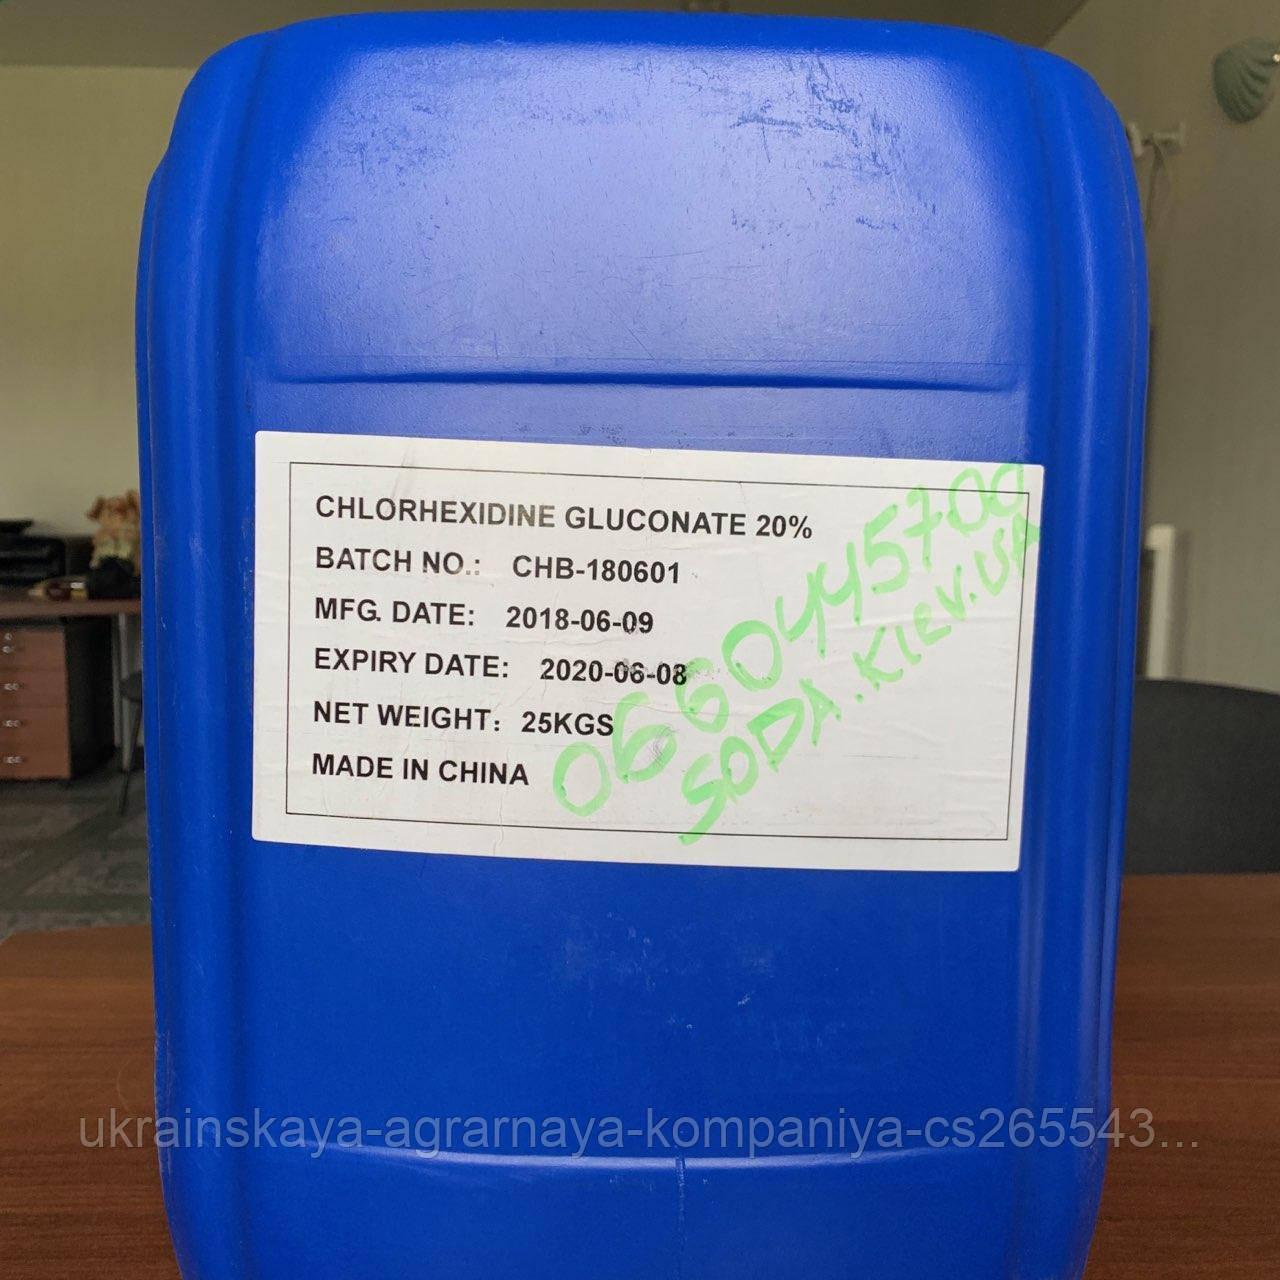 Хлоргексидин диглюконат 20% раствор